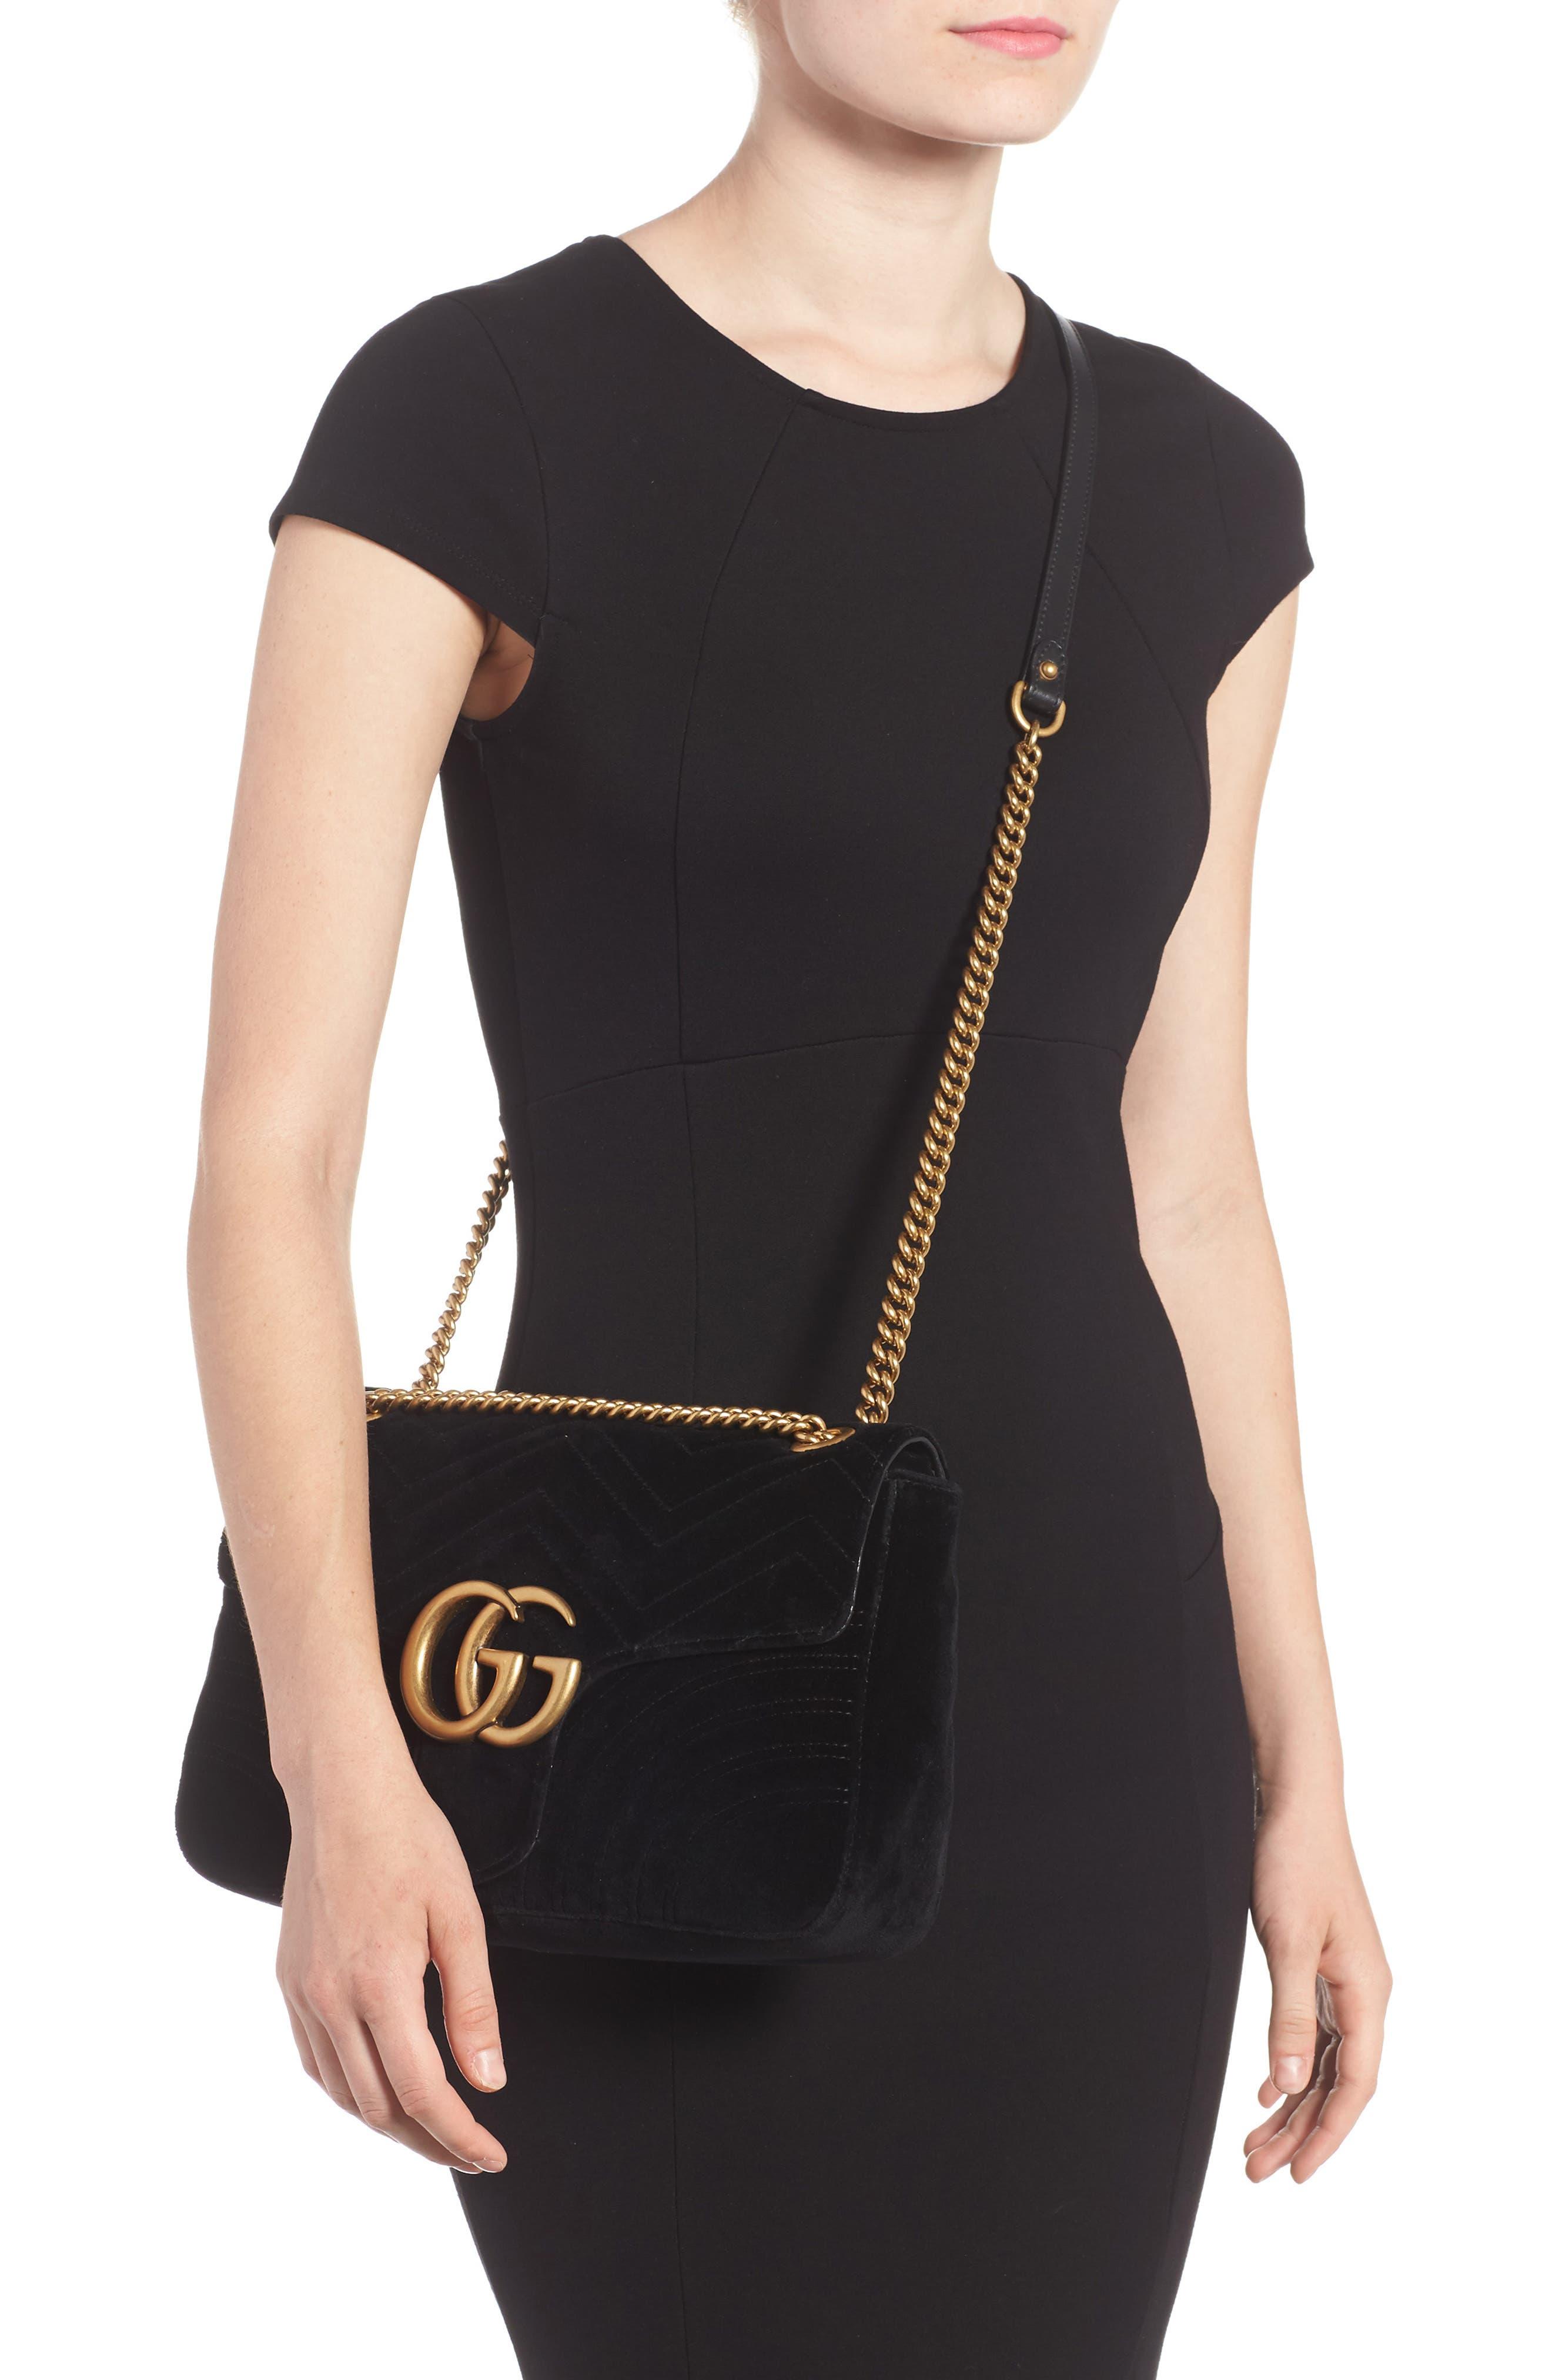 GUCCI, Medium GG Marmont 2.0 Matelassé Velvet Shoulder Bag, Alternate thumbnail 2, color, NERO